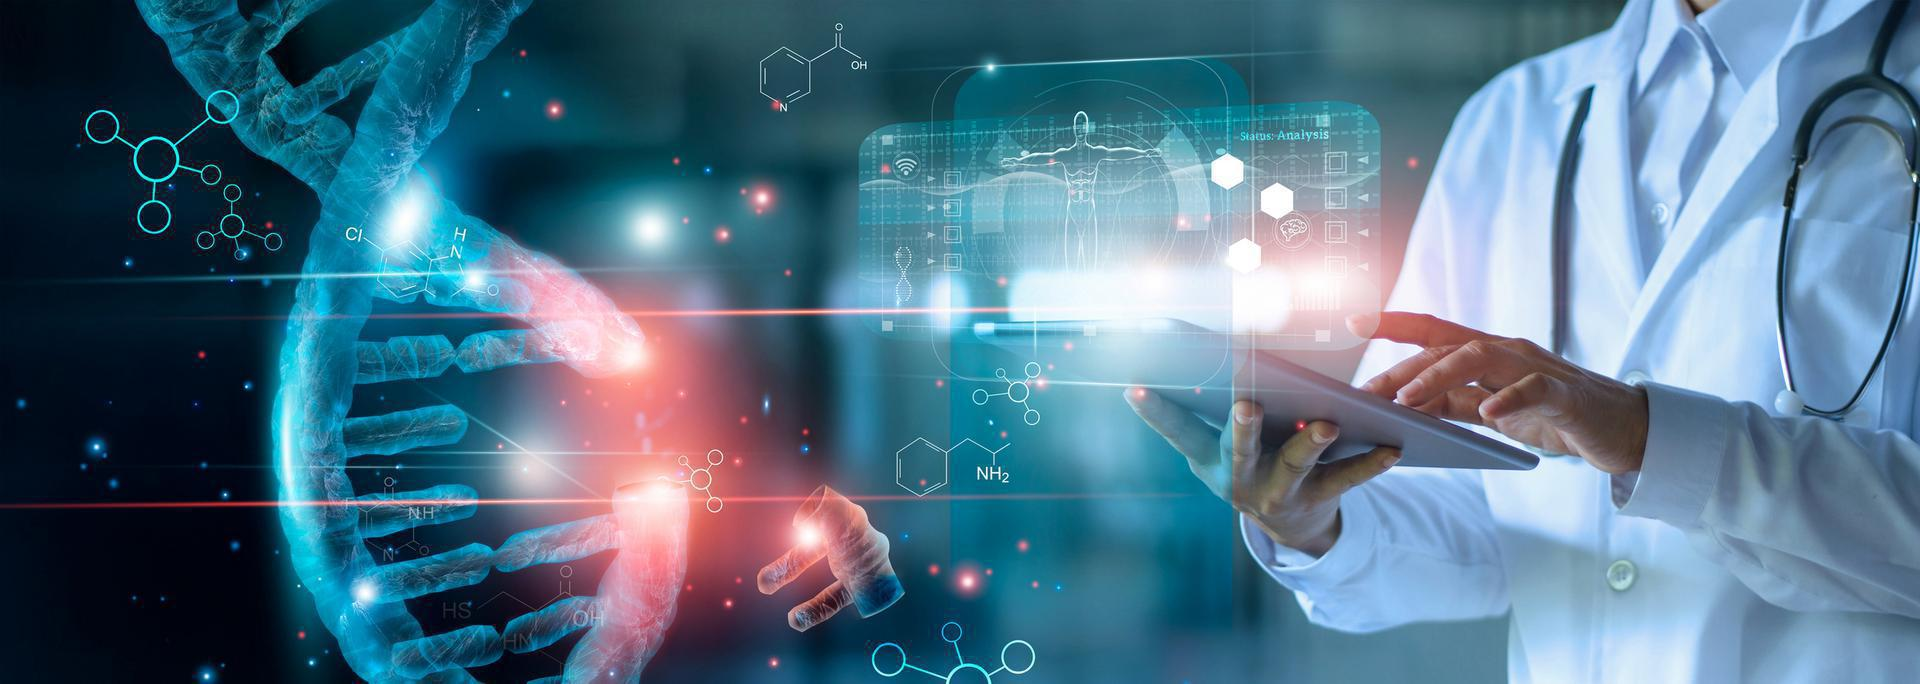 Drug Testing and DNA Testing - Northglenn CO - featured